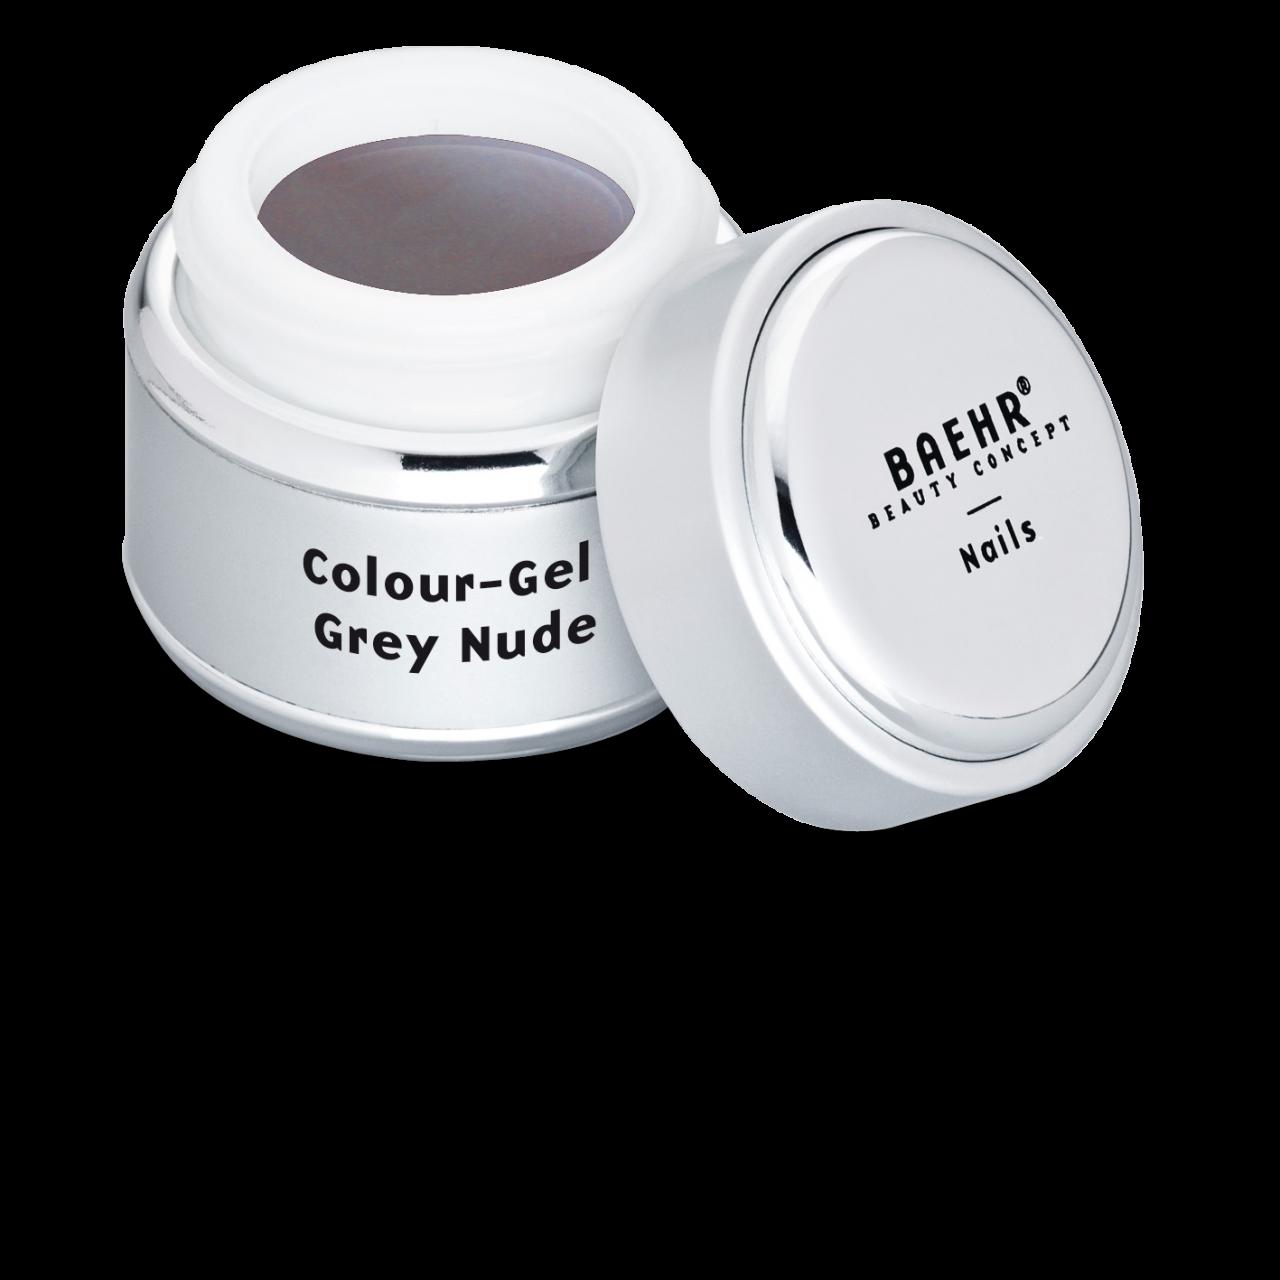 Colour-Gel Grey Nude 5 ml